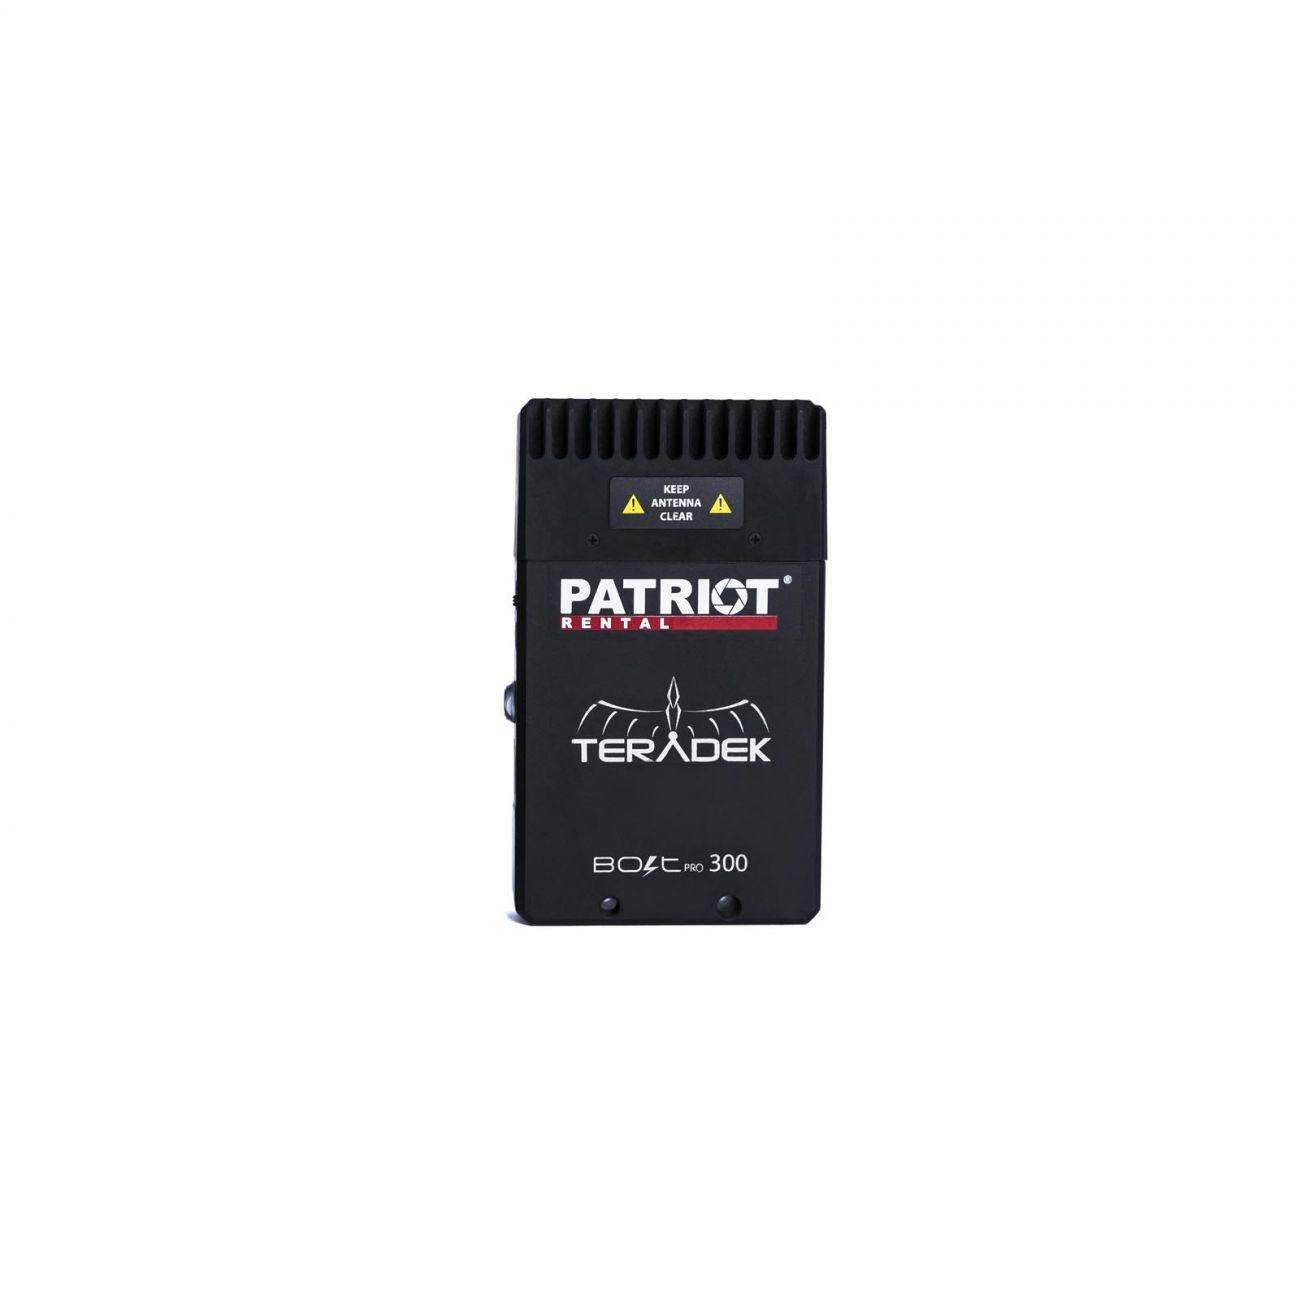 TERADEK BOLT 300 RX SDI/HDMI 90m